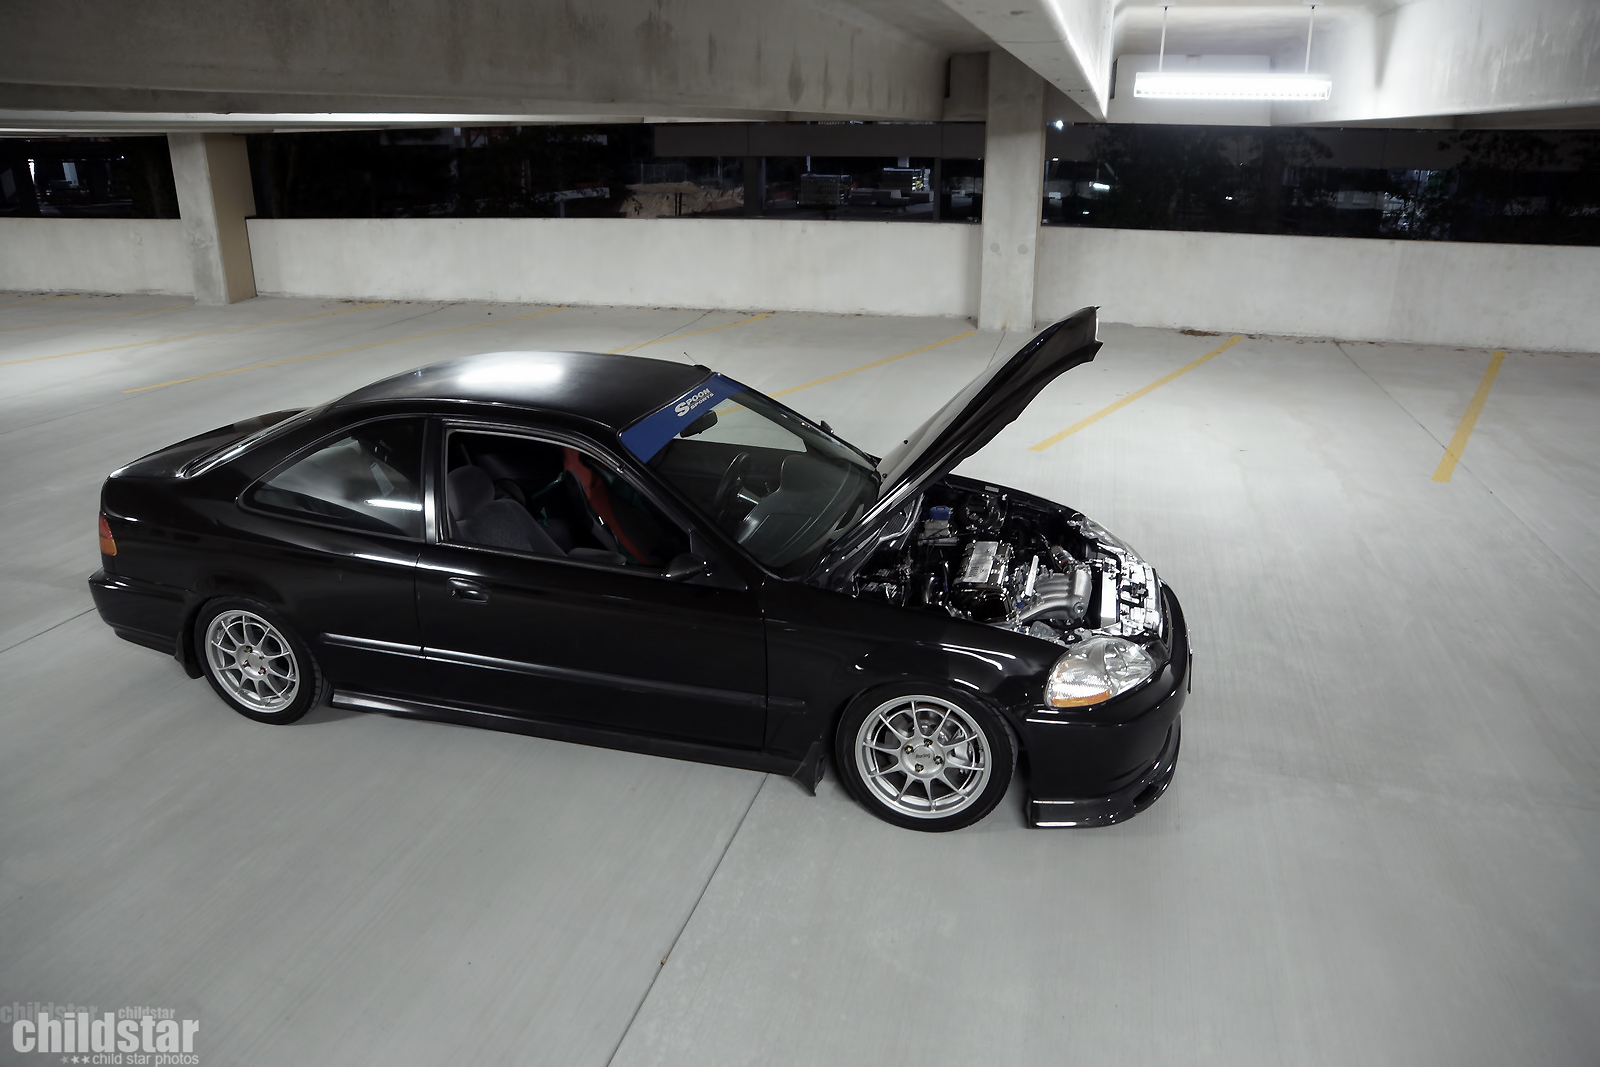 Honda Athens Ga >> **OFFICIAL ENKEI WHEELS THREAD (RPF1, 92, J-Speed, etc...)** - Page 195 - Honda-Tech - Honda ...